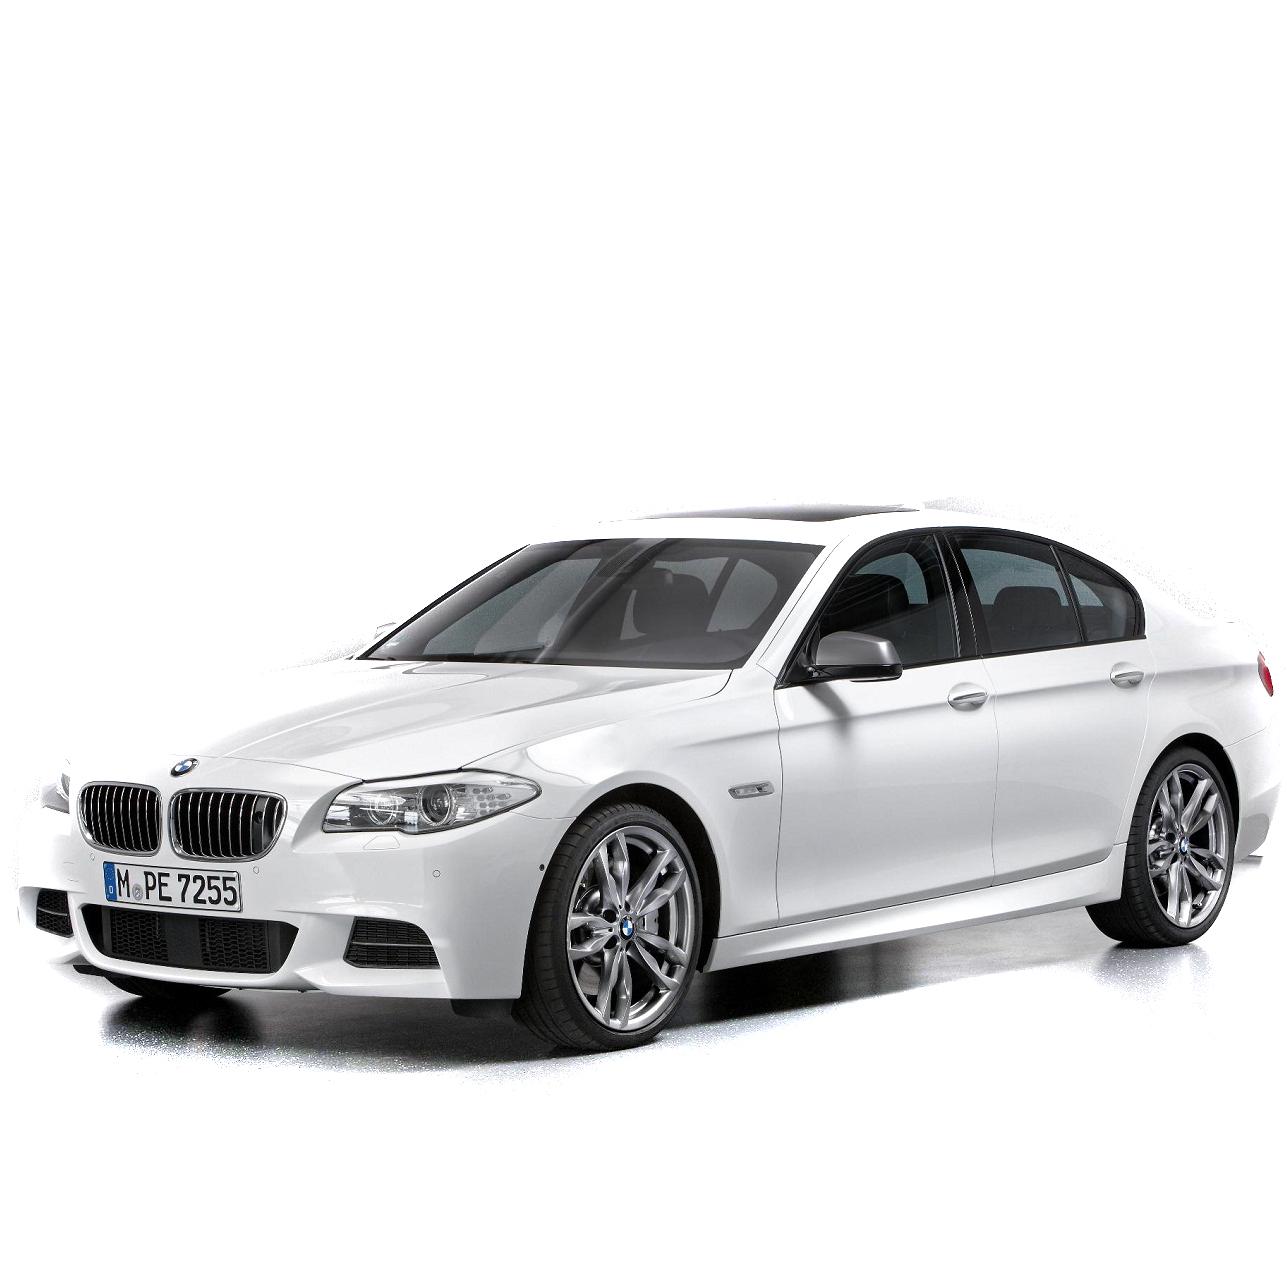 BMW 5 Series (F10) 2013-2017